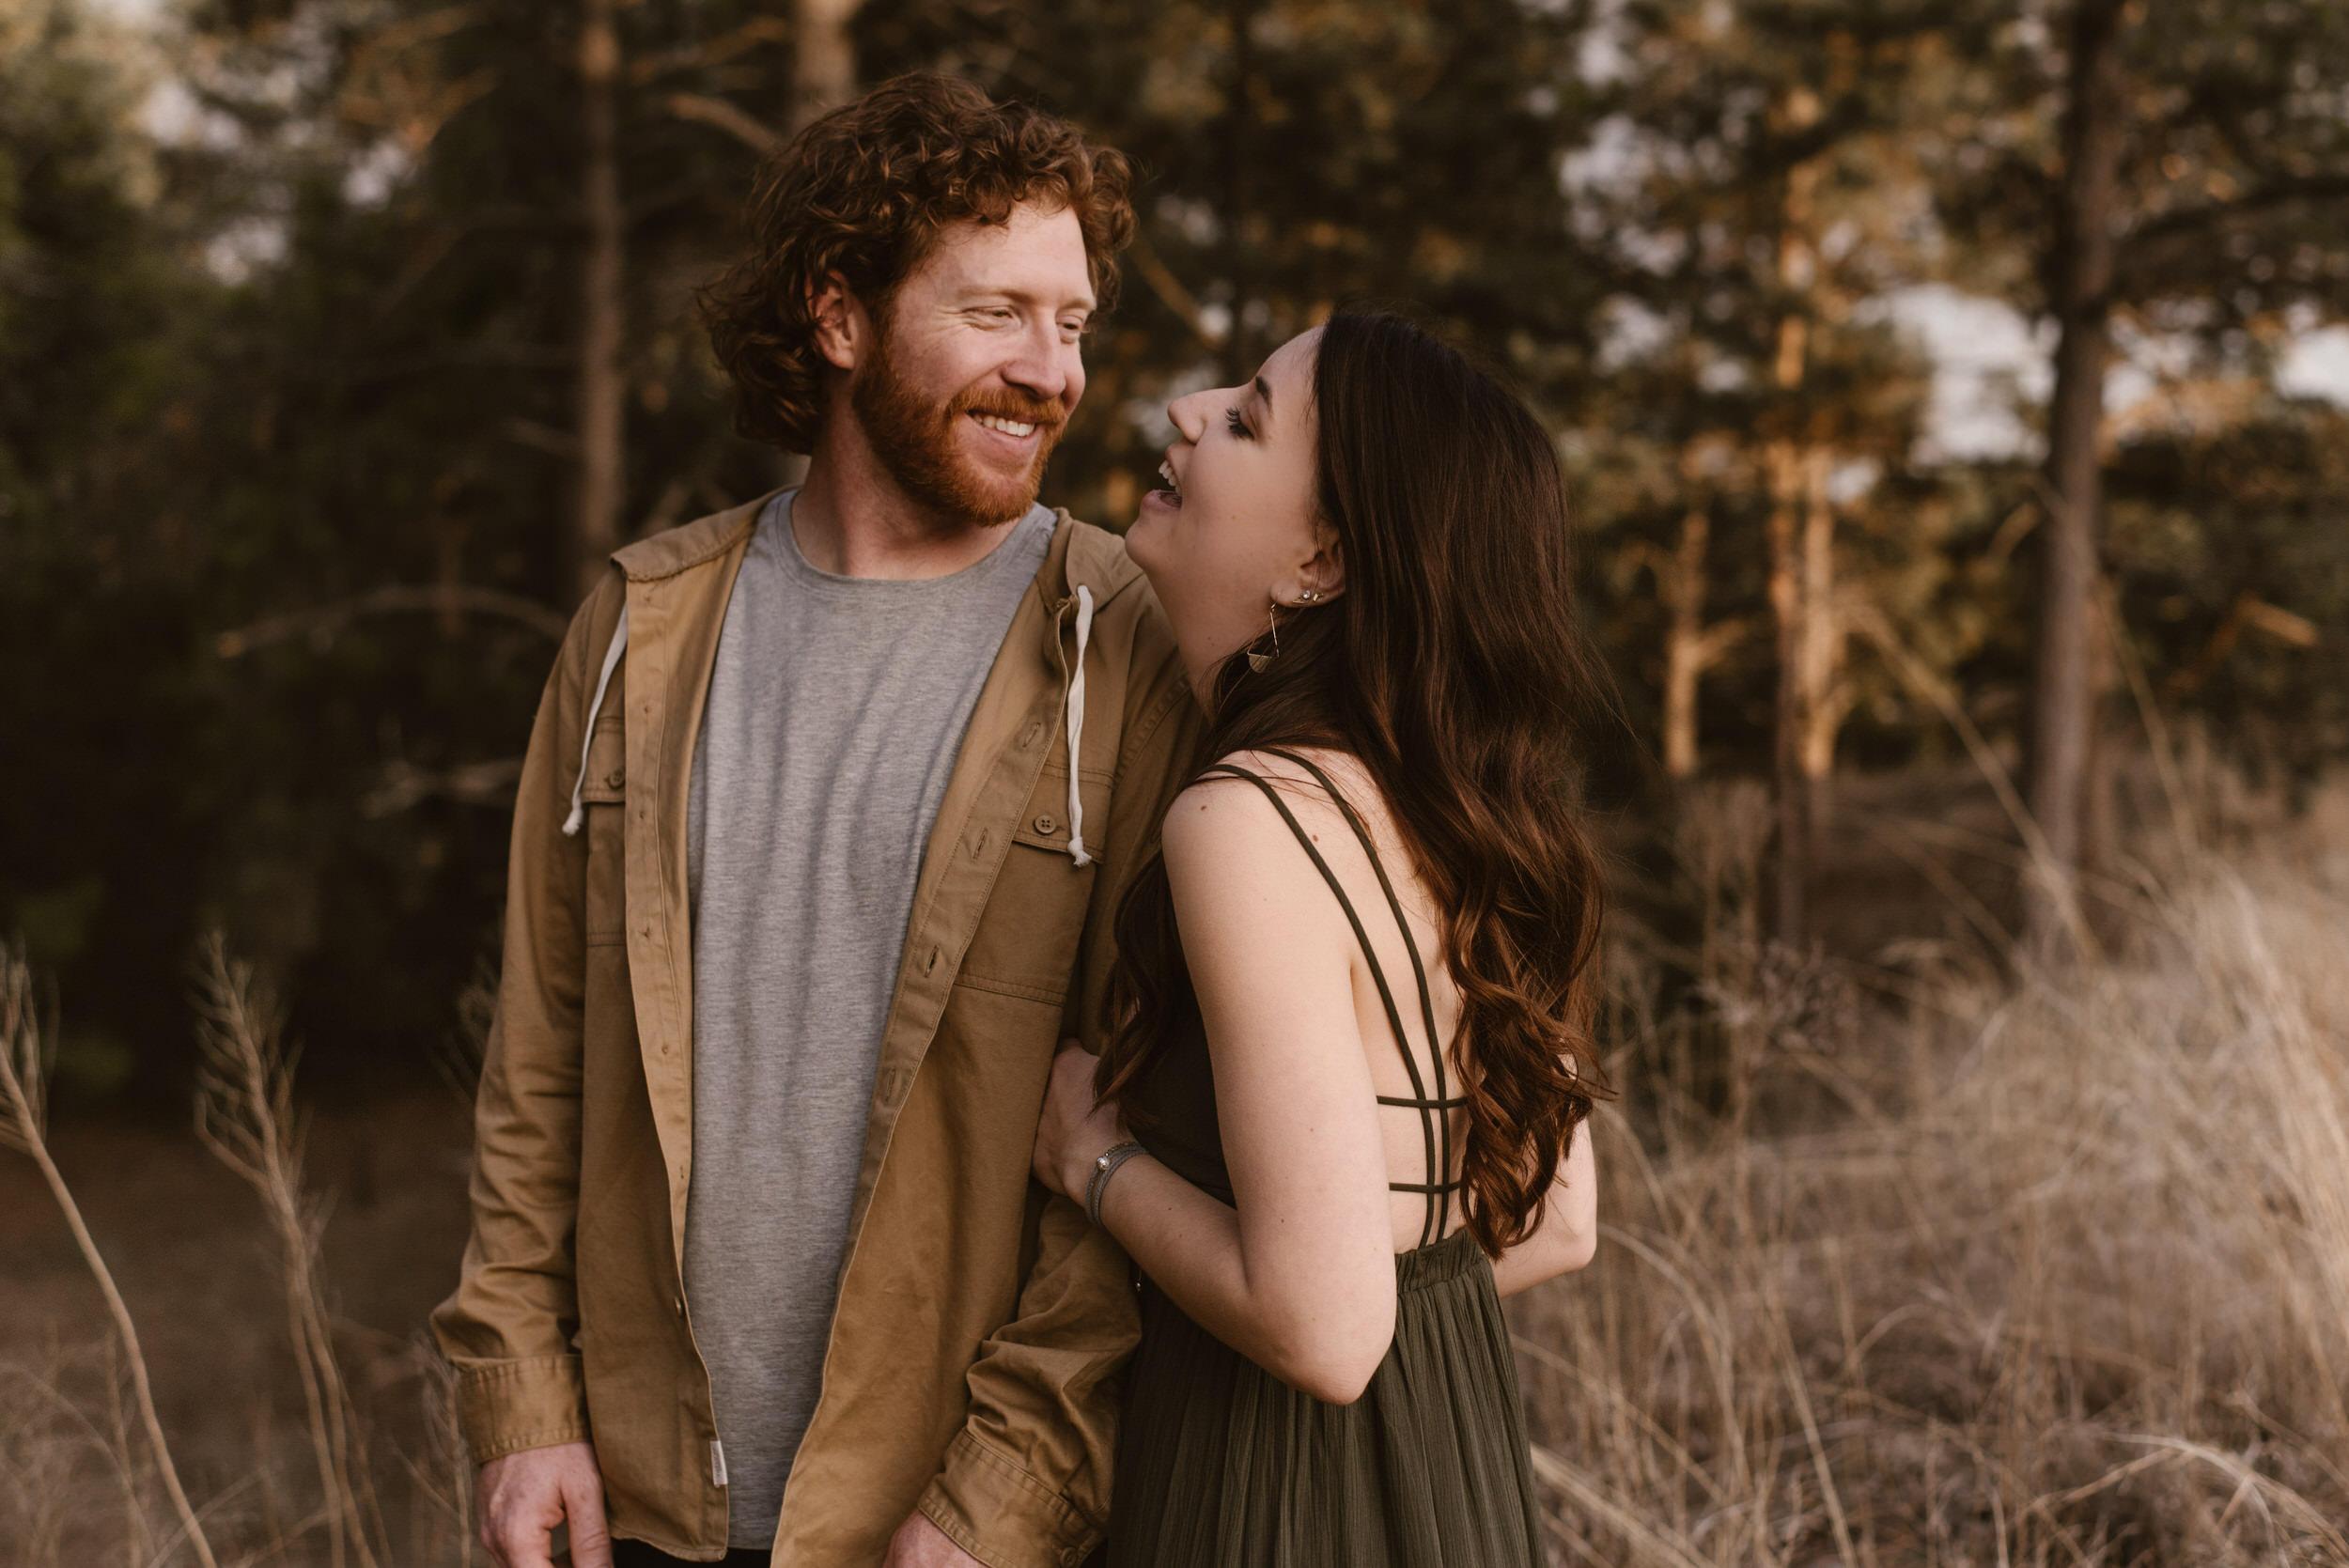 Nebraska-Engagement-Session-Halsey-Forest-Kaylie-Sirek-Photography-058.jpg